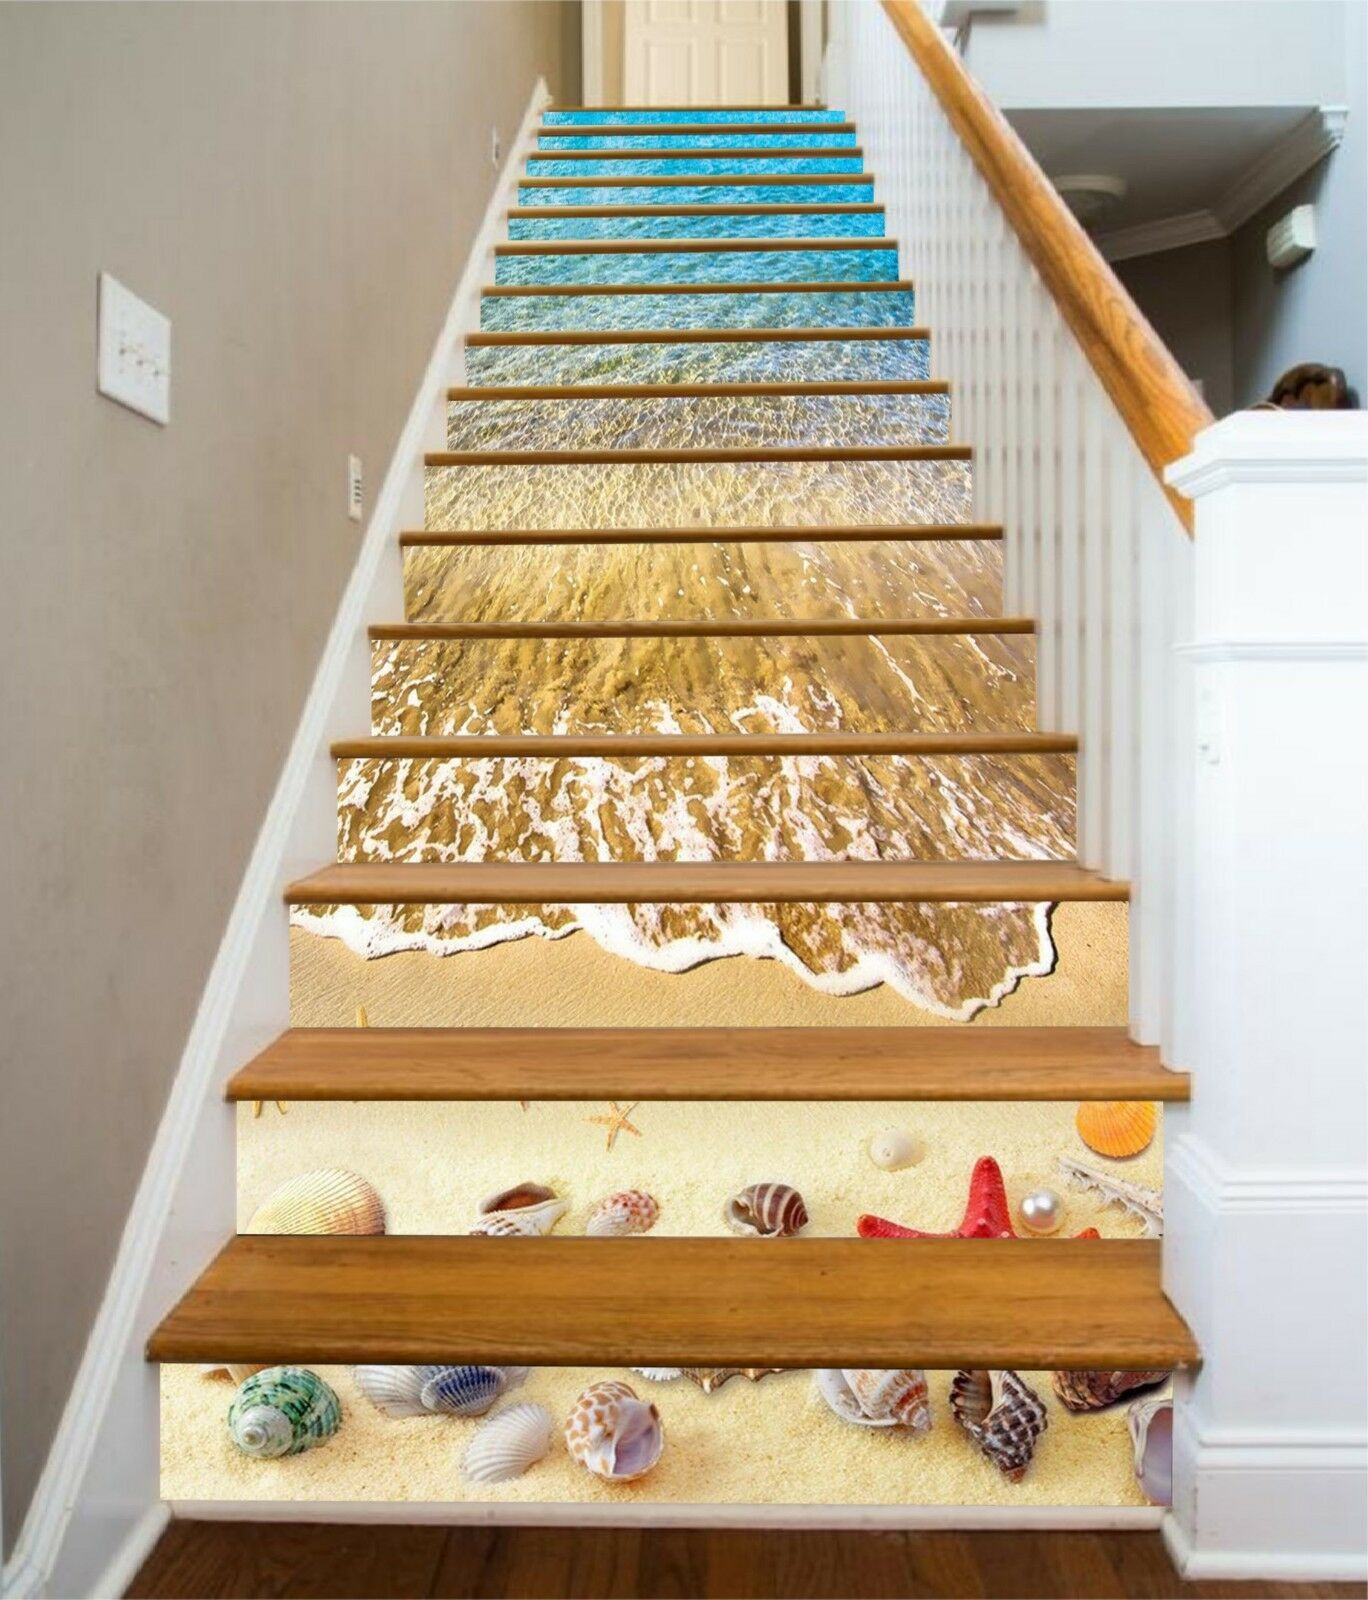 3D Seafish Sea Stair Risers Decoration Photo Mural Vinyl Decal Wallpaper CA